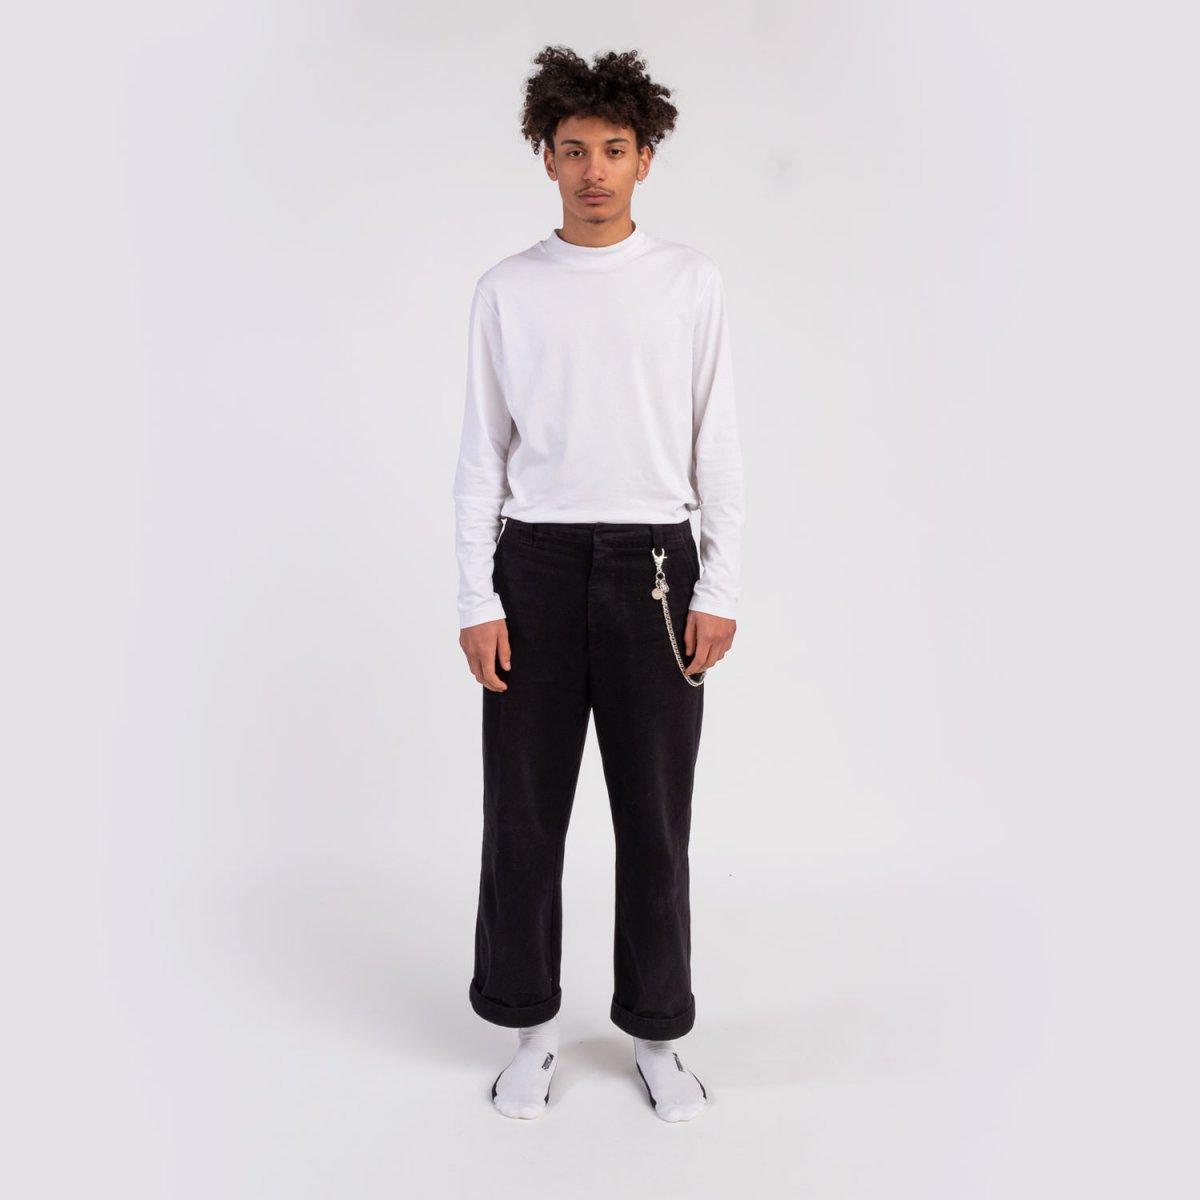 catena-pantalone-uomo-argento-fabbrica-supplies